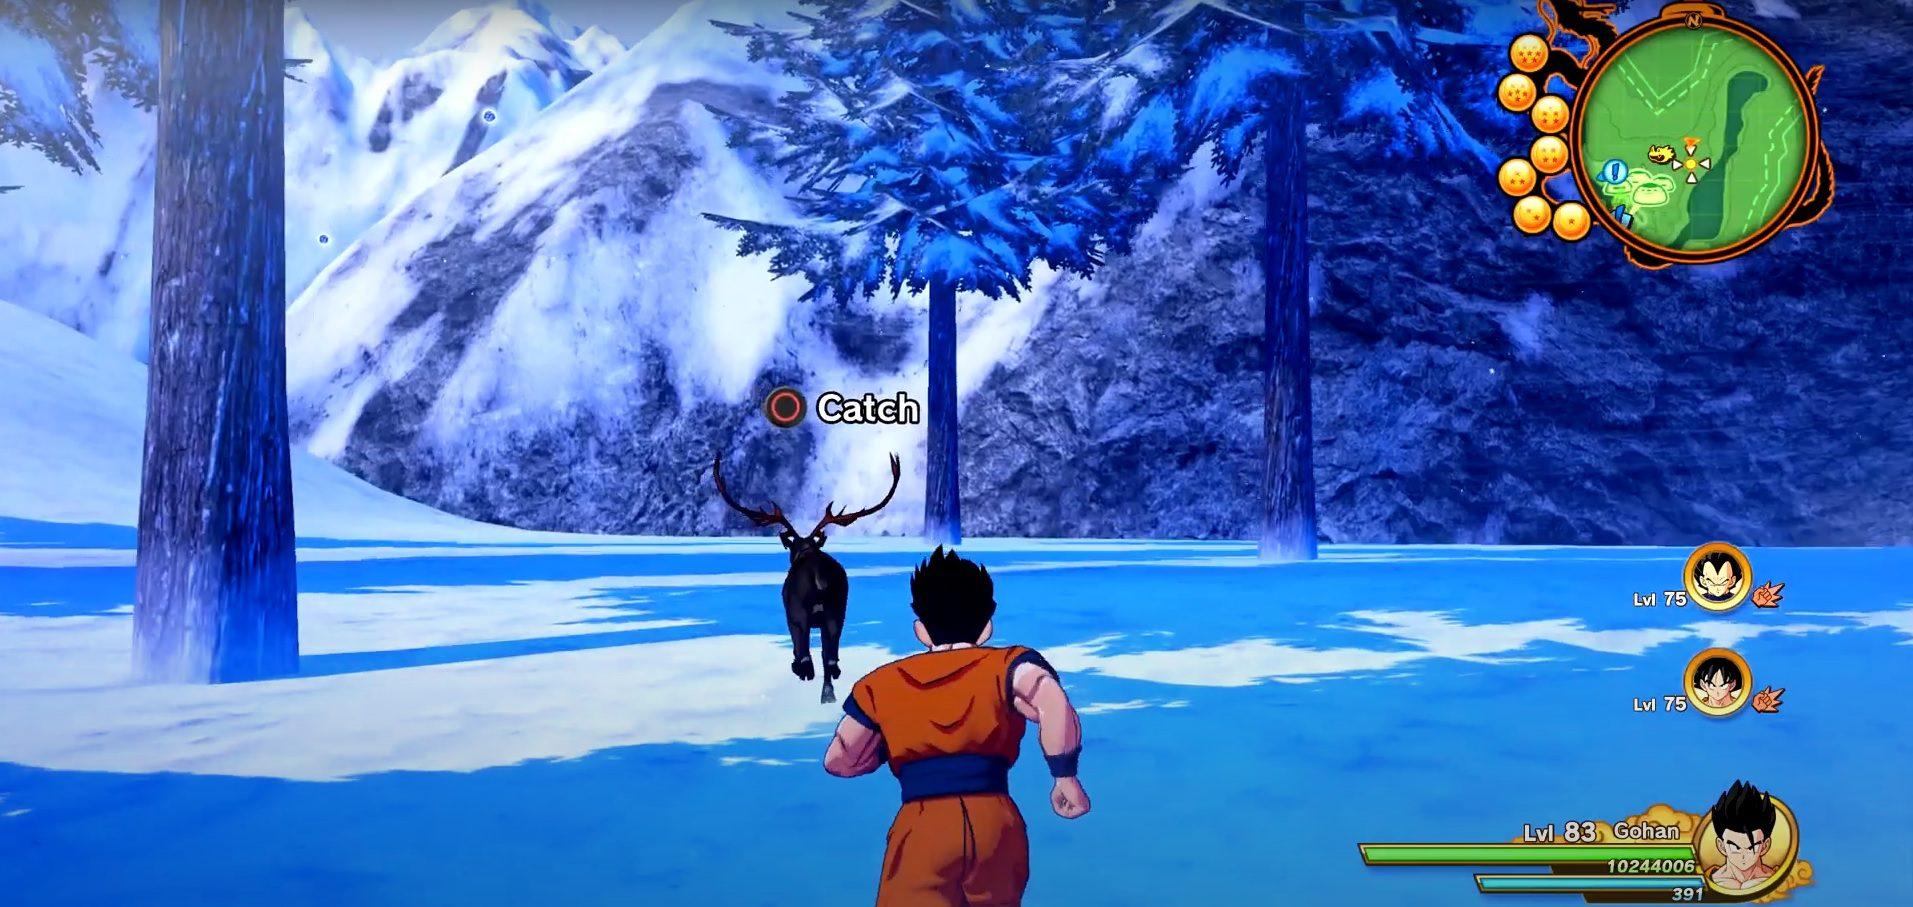 Dragon Ball Z Kakarot Reindeer Location